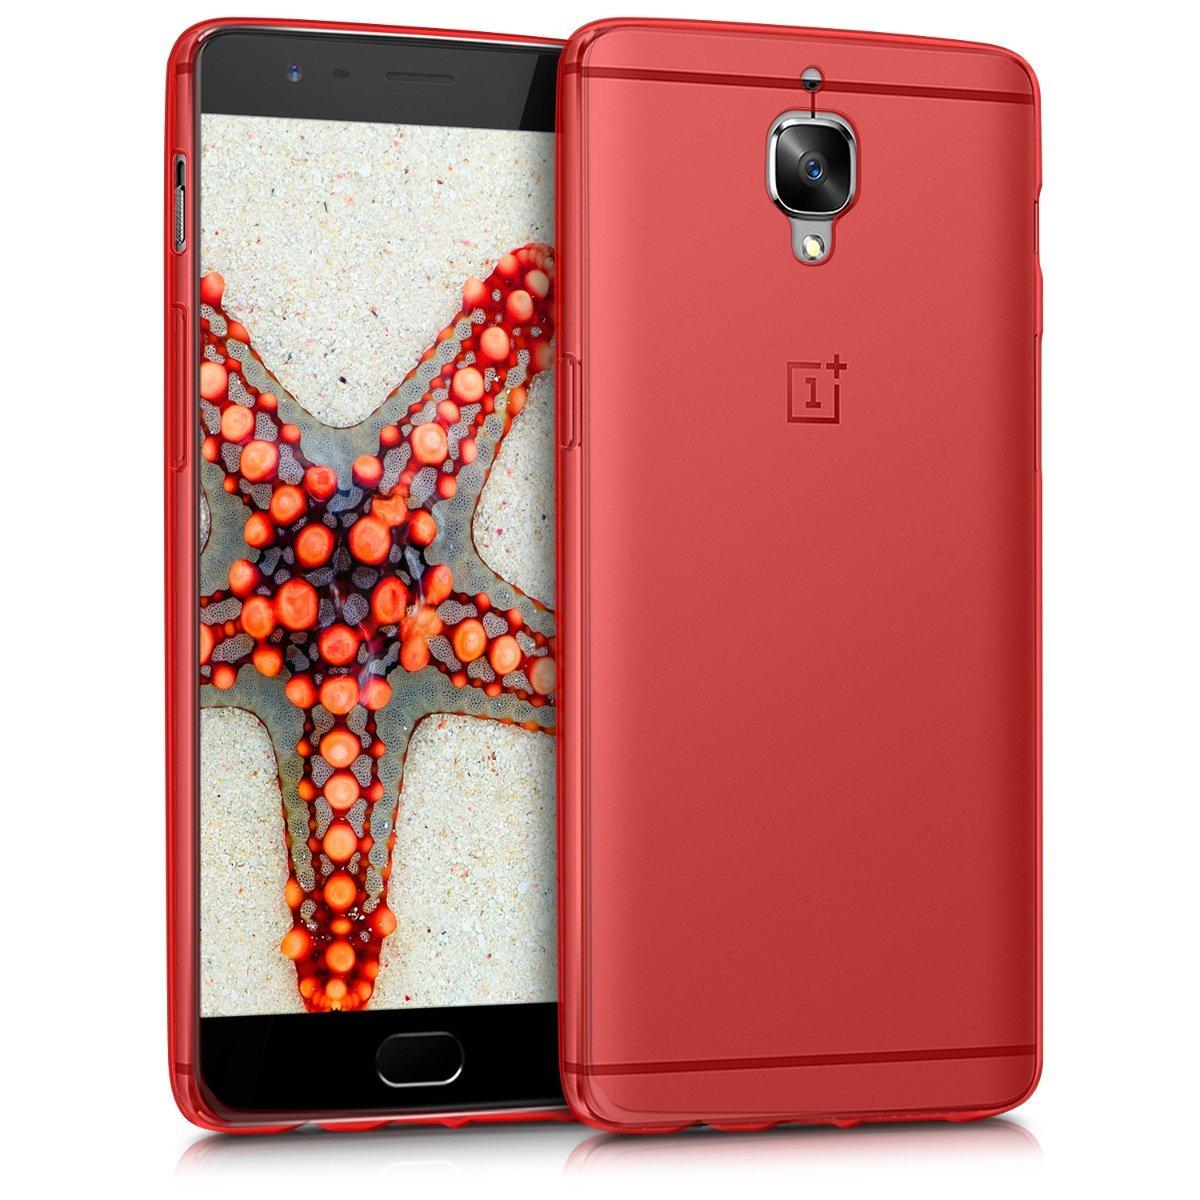 KW Θήκη Σιλικόνης OnePlus 3/3T - Red (38836.09)